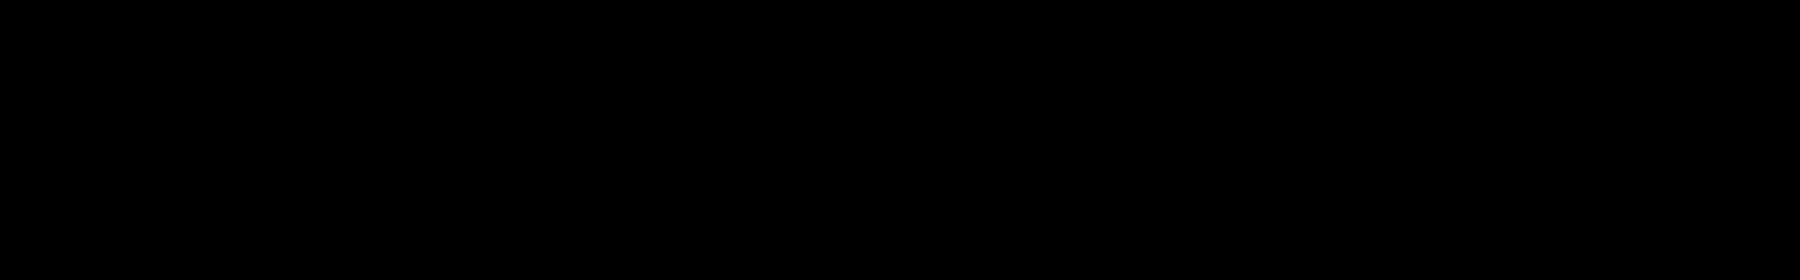 DECEMBER X audio waveform